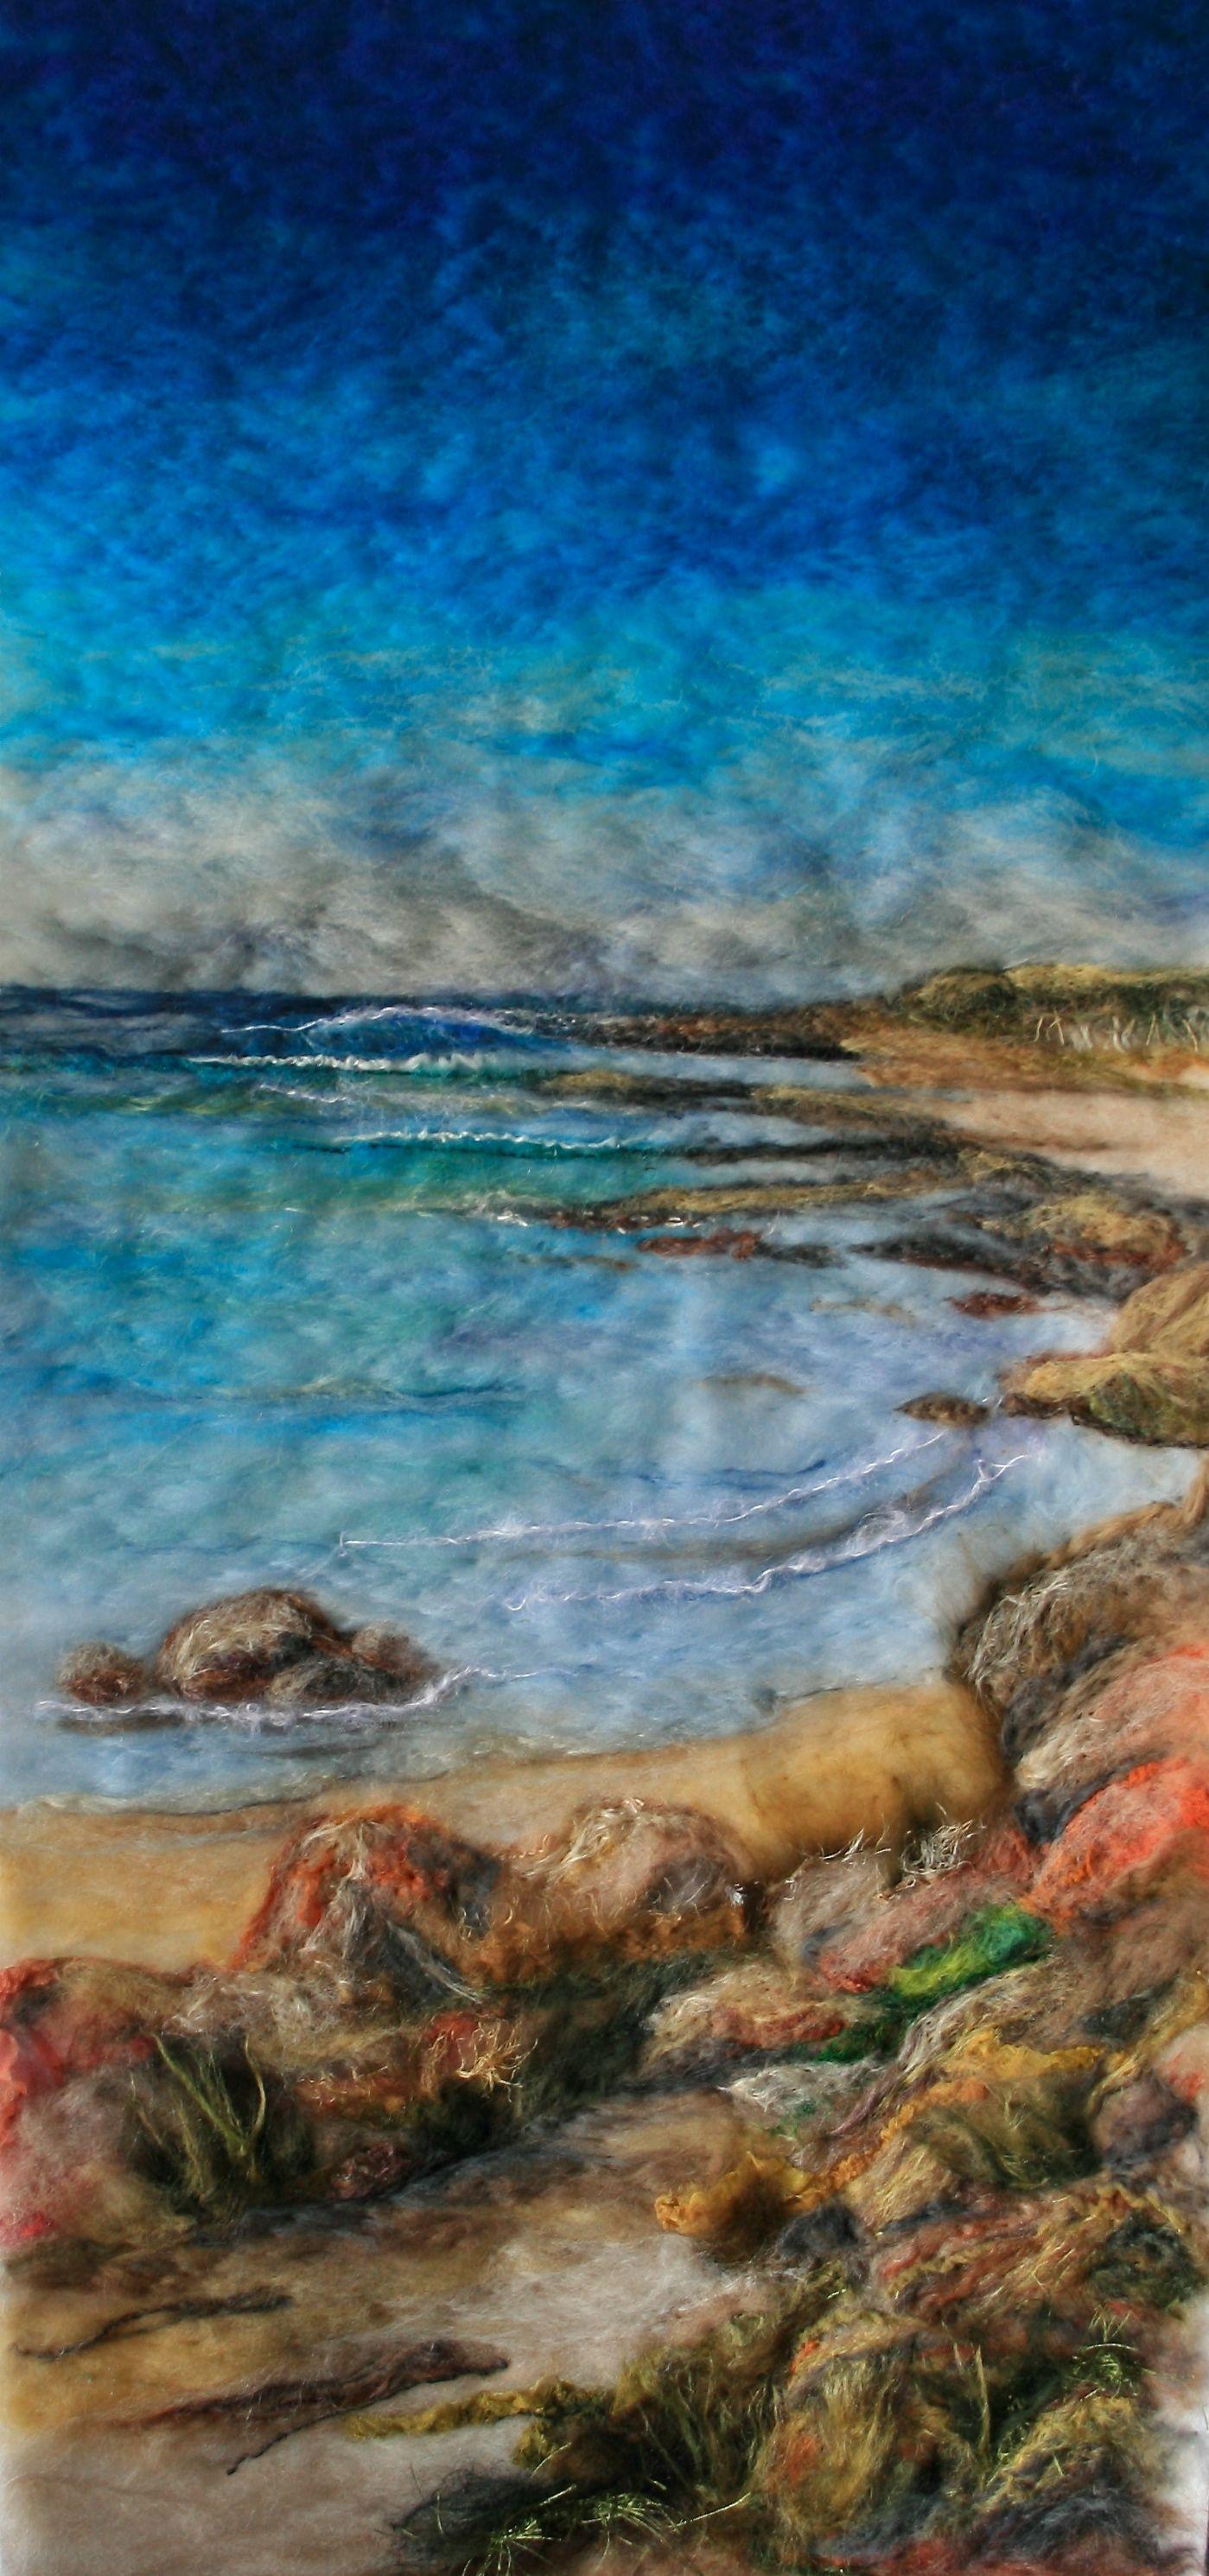 Naracoopa – a felt painting